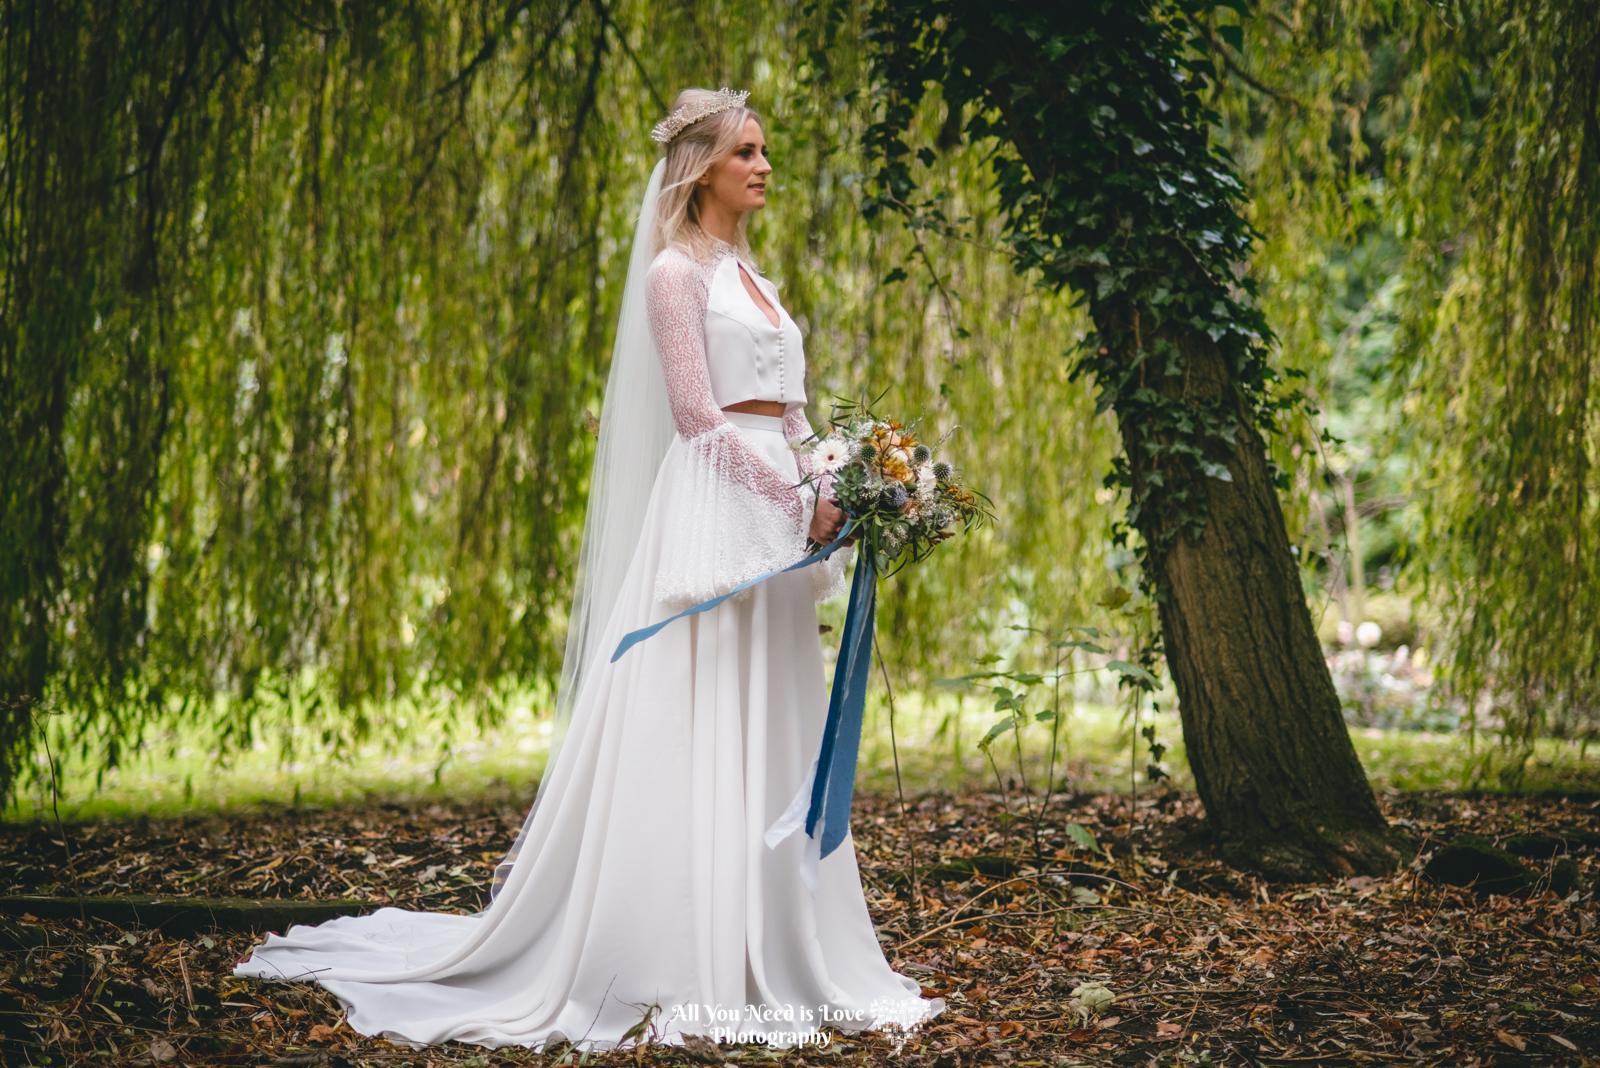 bespoke wedding dress, handmade wedding dress, on of a kind lace wedding dress